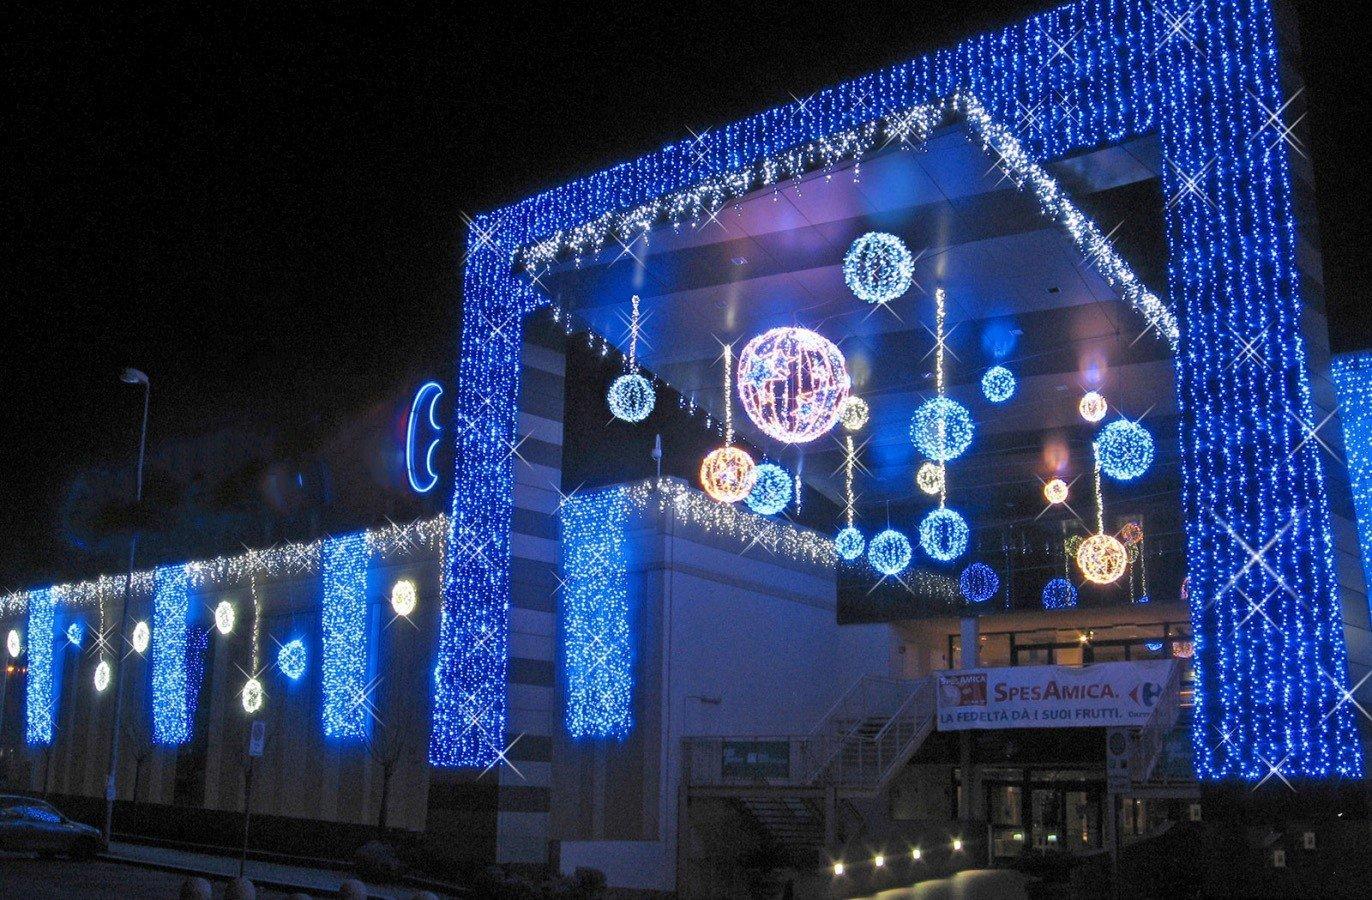 Noleggio luminarie per centri commerciali, noleggio luminarie natalizie stradali, noleggio luminarie rieti, luminari natalizie rieti, luminarie ed illuminazione centri commerciali rieti